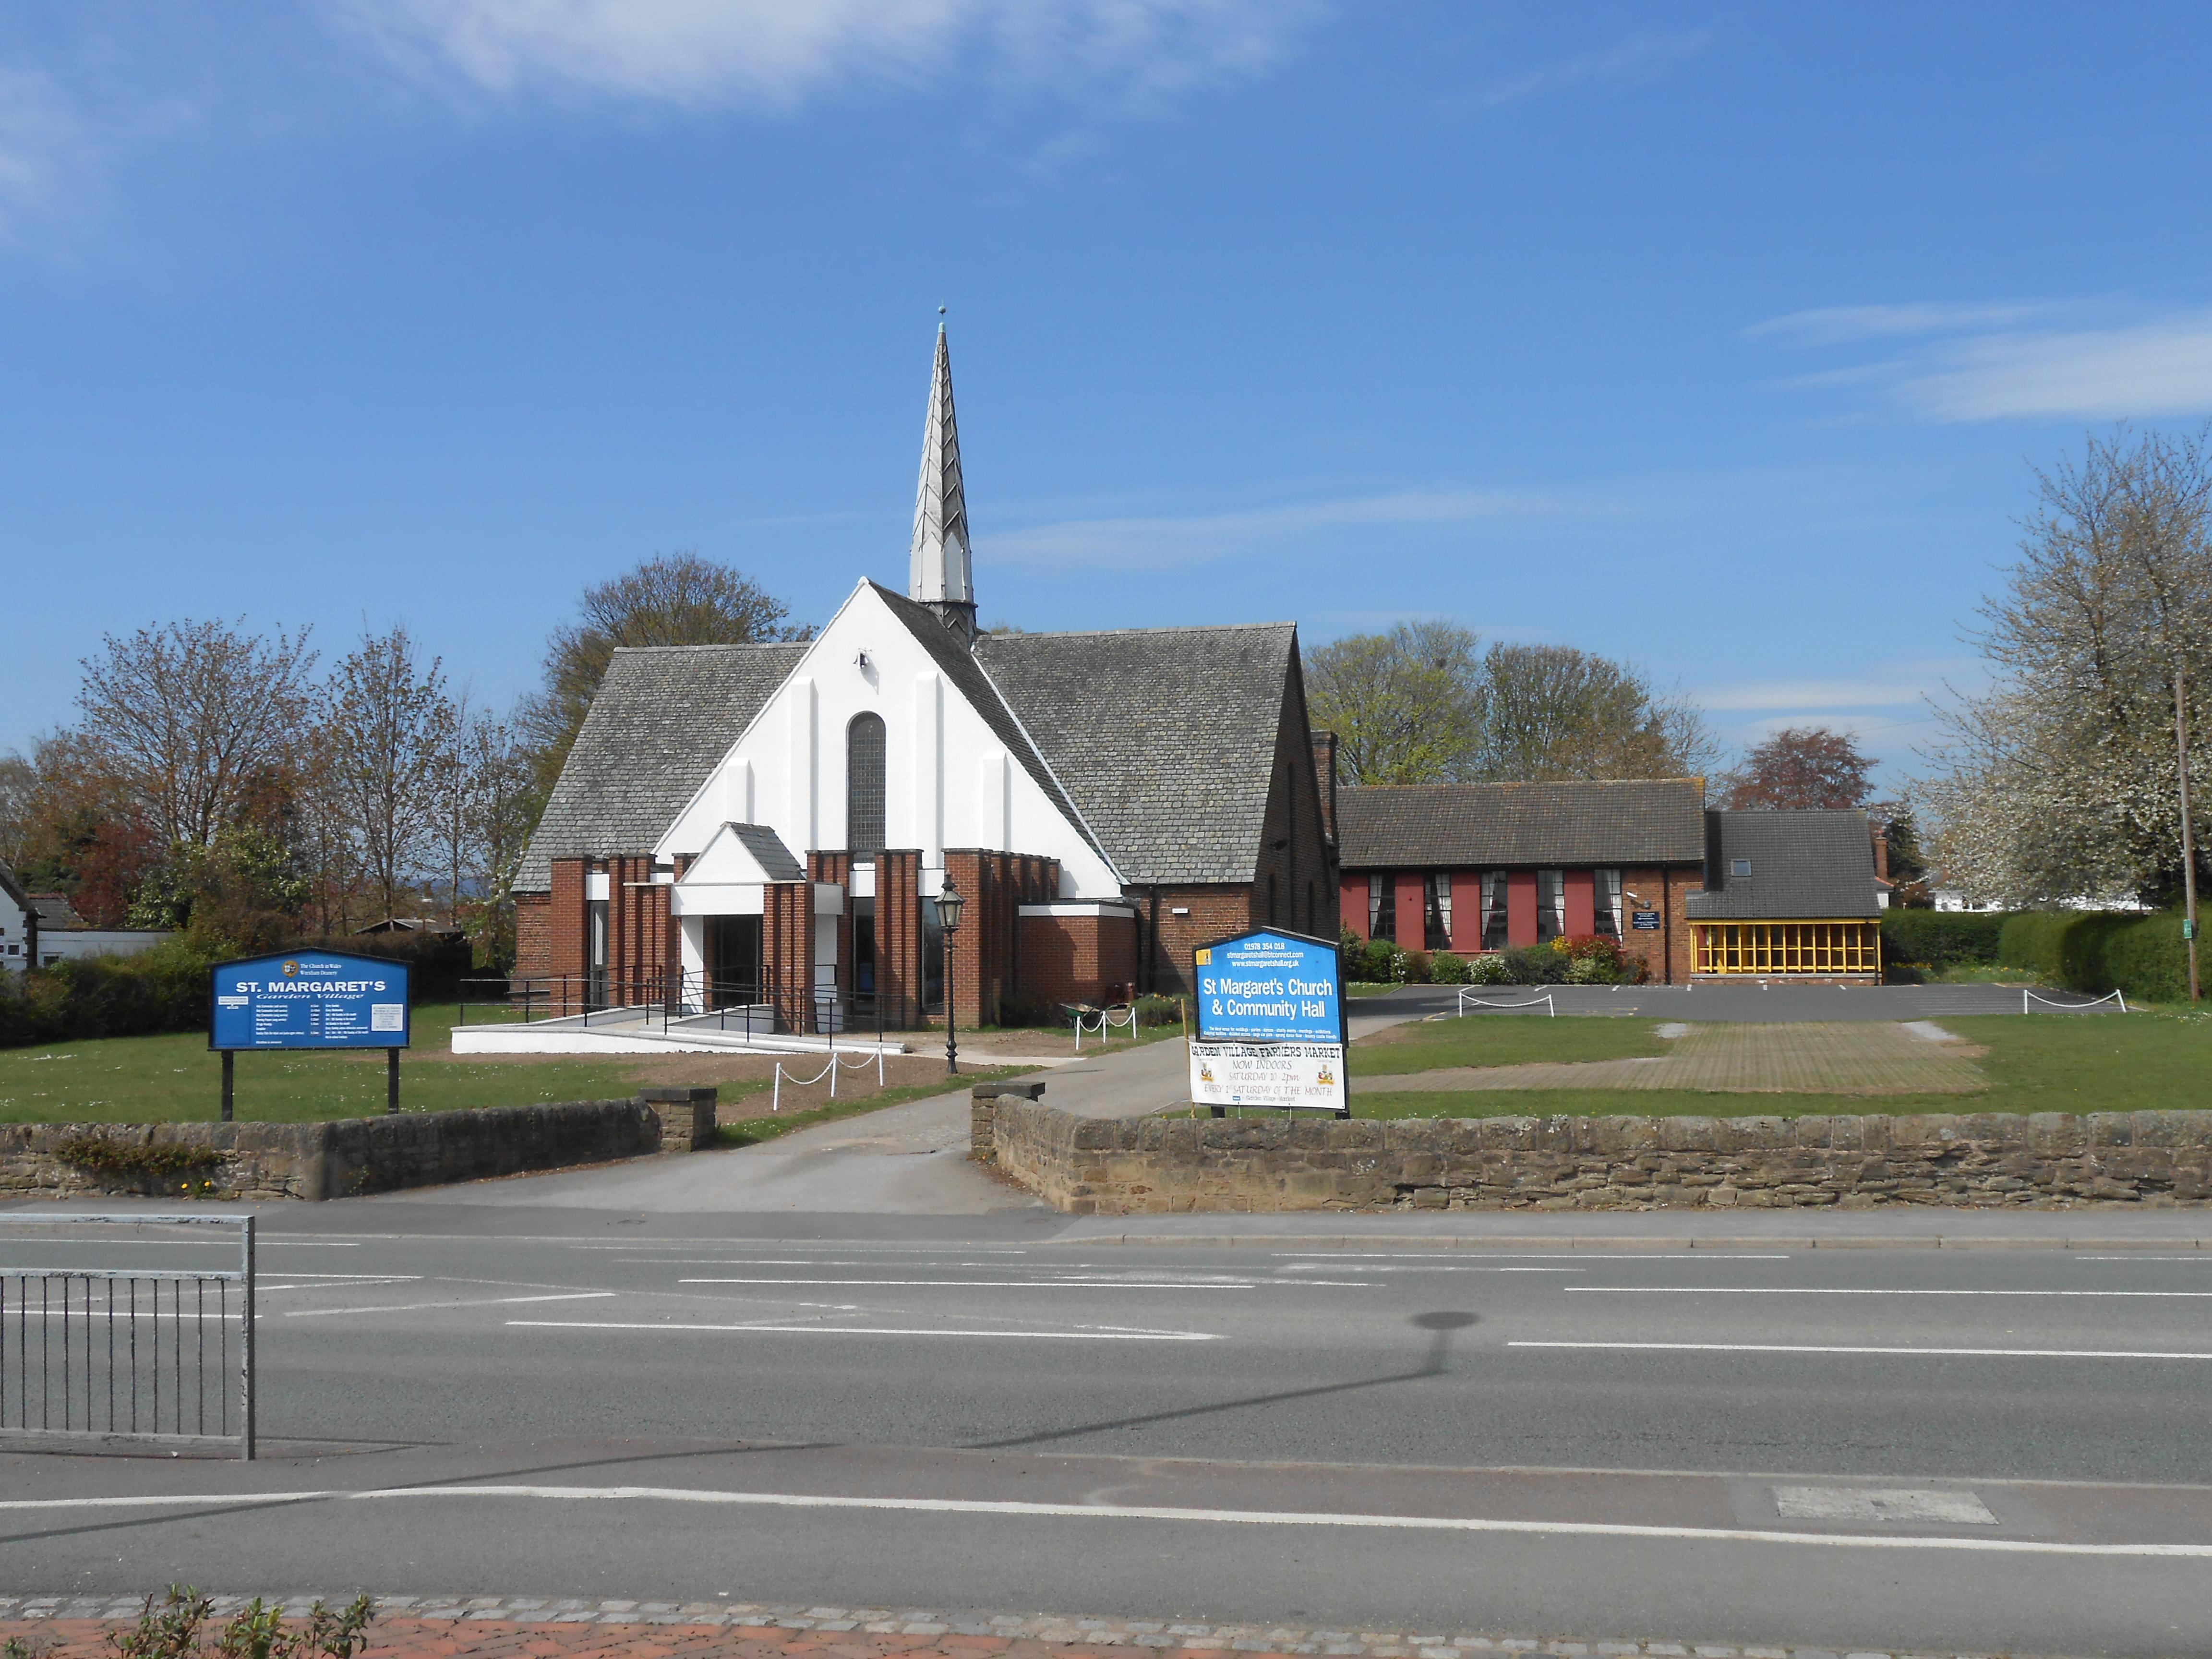 file st margaret s church garden village 8 wikimedia mons